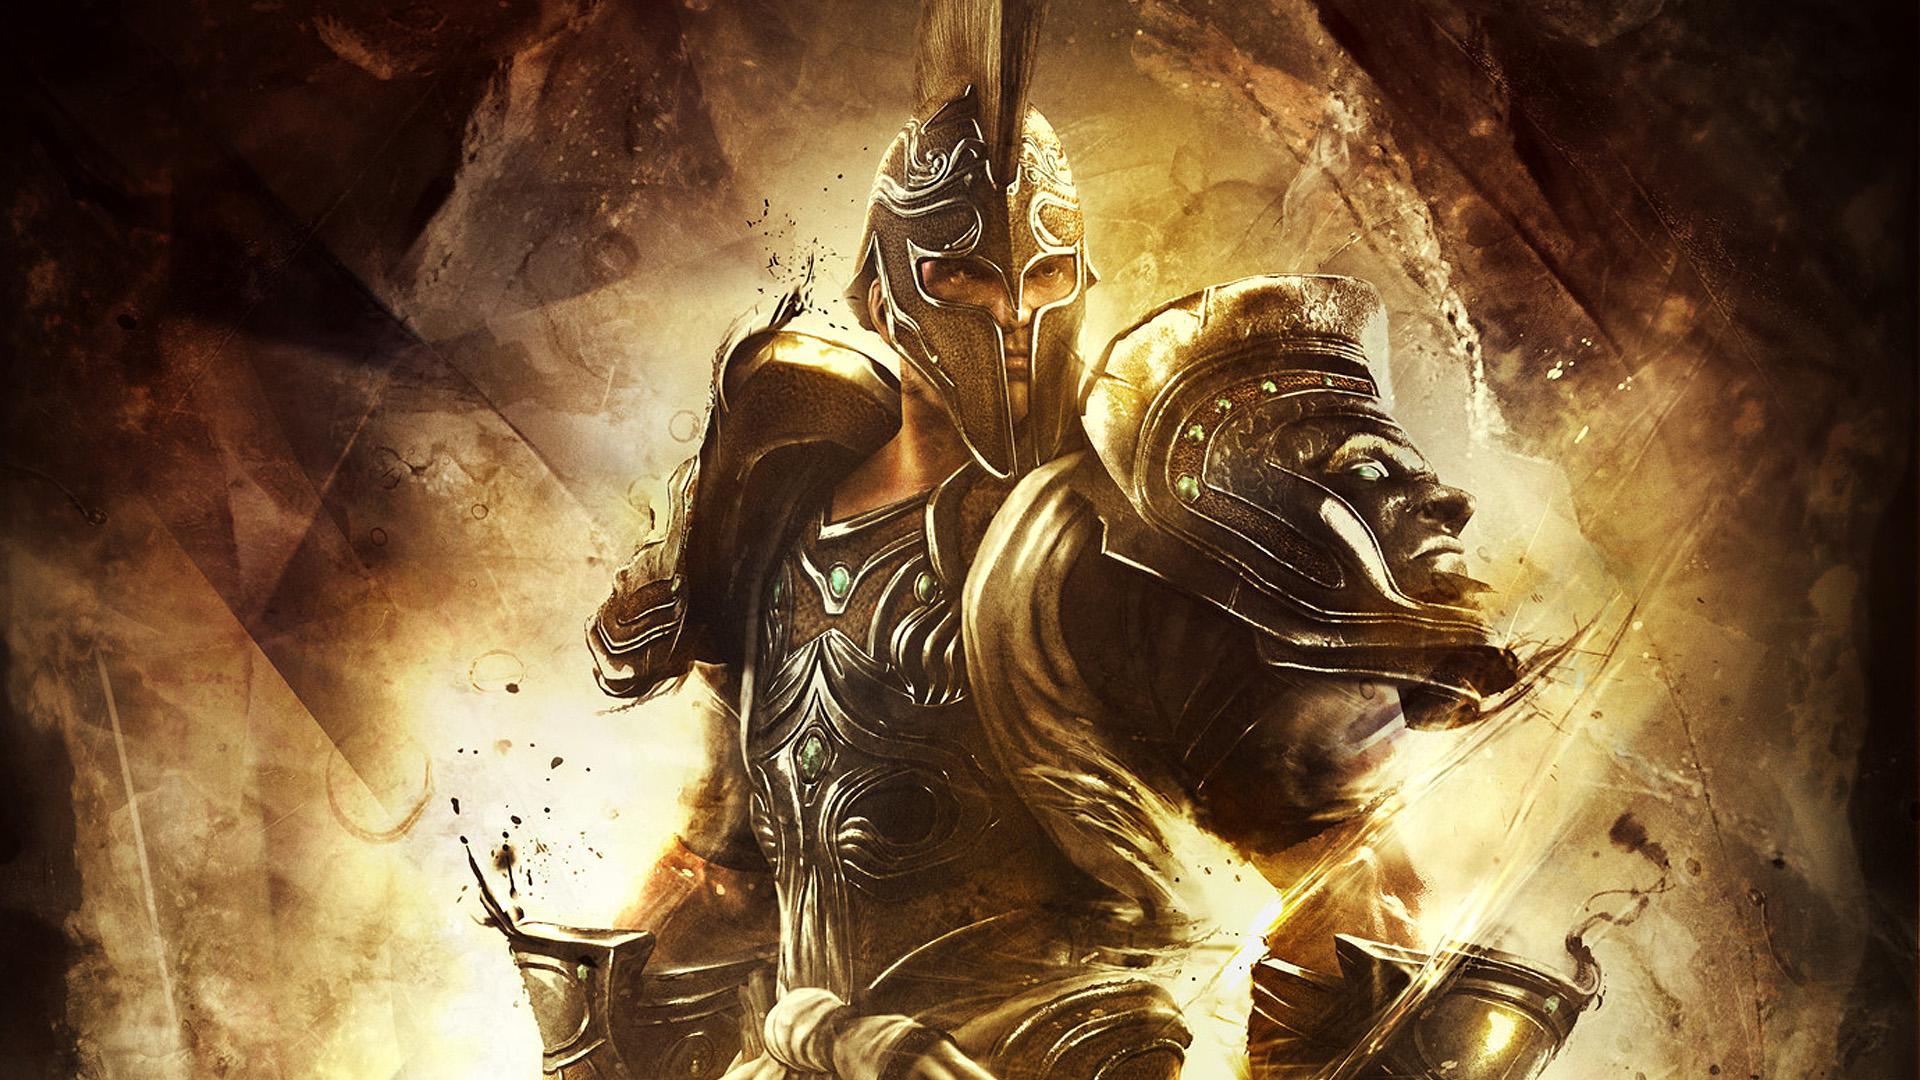 god of war wallpapers A3 - HD Desktop Wallpapers | 4k HD